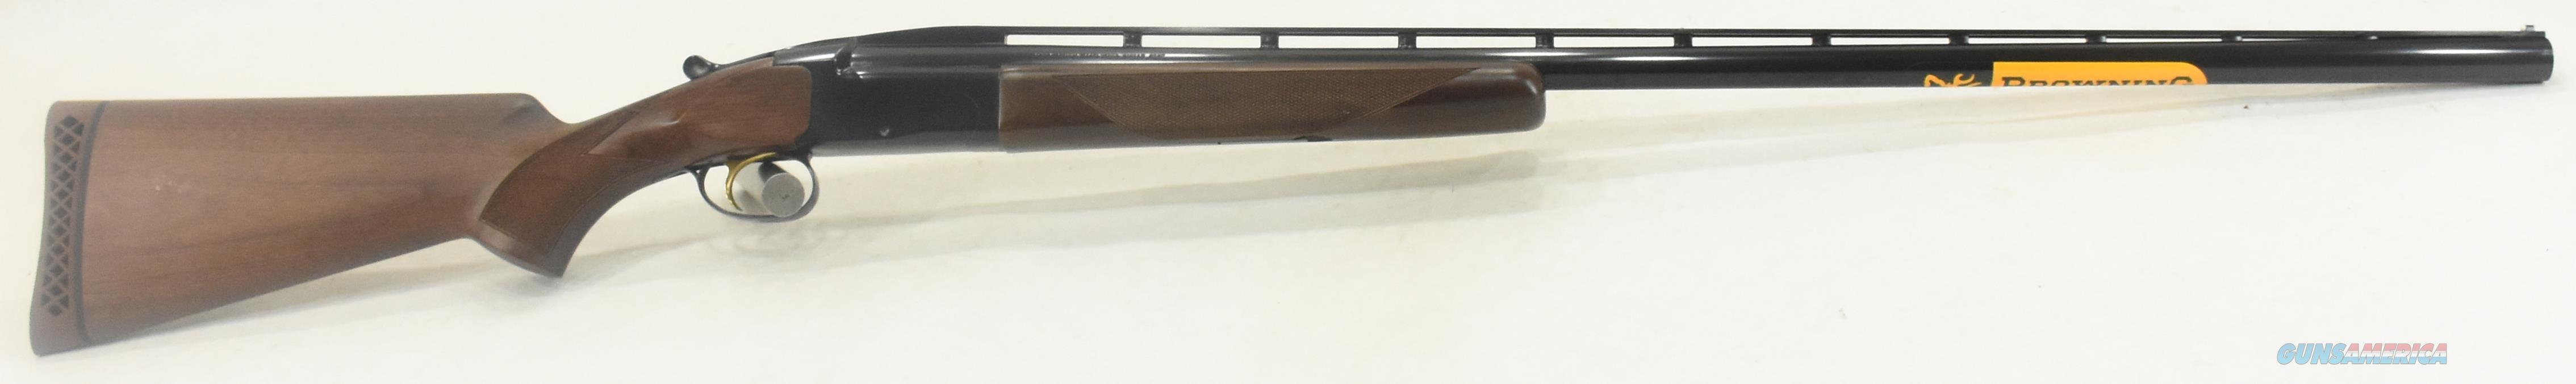 BT99 Walnut 12Ga 34-2.75In 017054401  Guns > Shotguns > Browning Shotguns > Over Unders > Other OU > Trap/Skeet